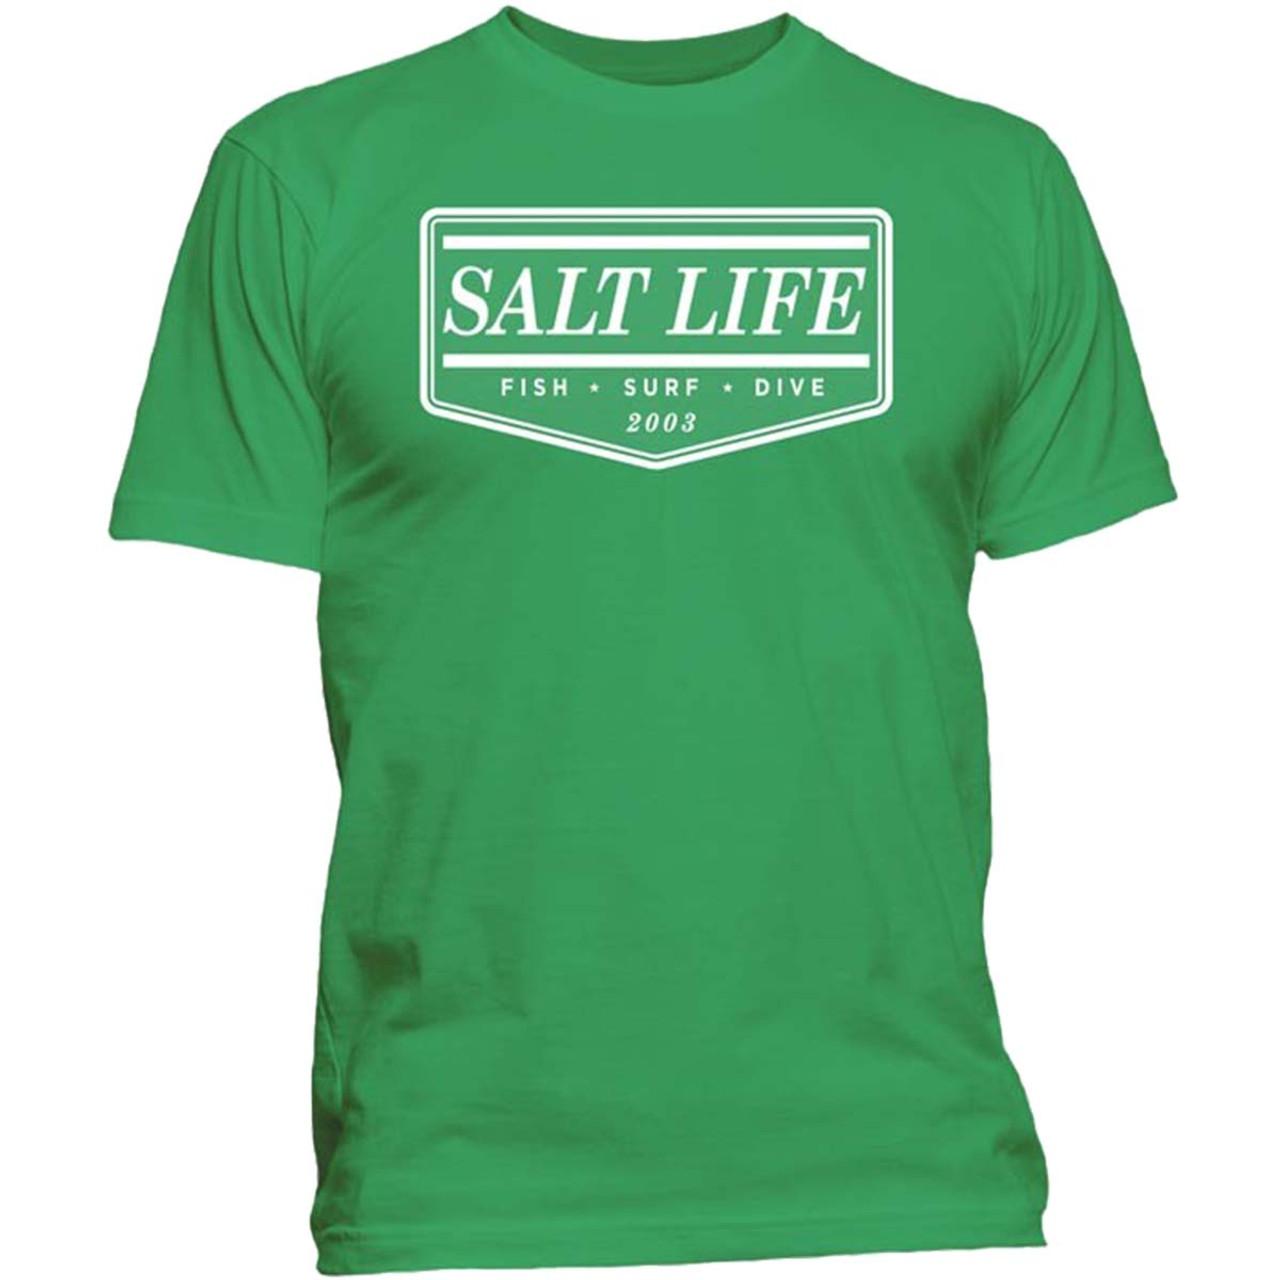 347586b720848 Salt Life Mens The Original Short Sleeve Front Print T-shirt - Trenz Shirt  Company